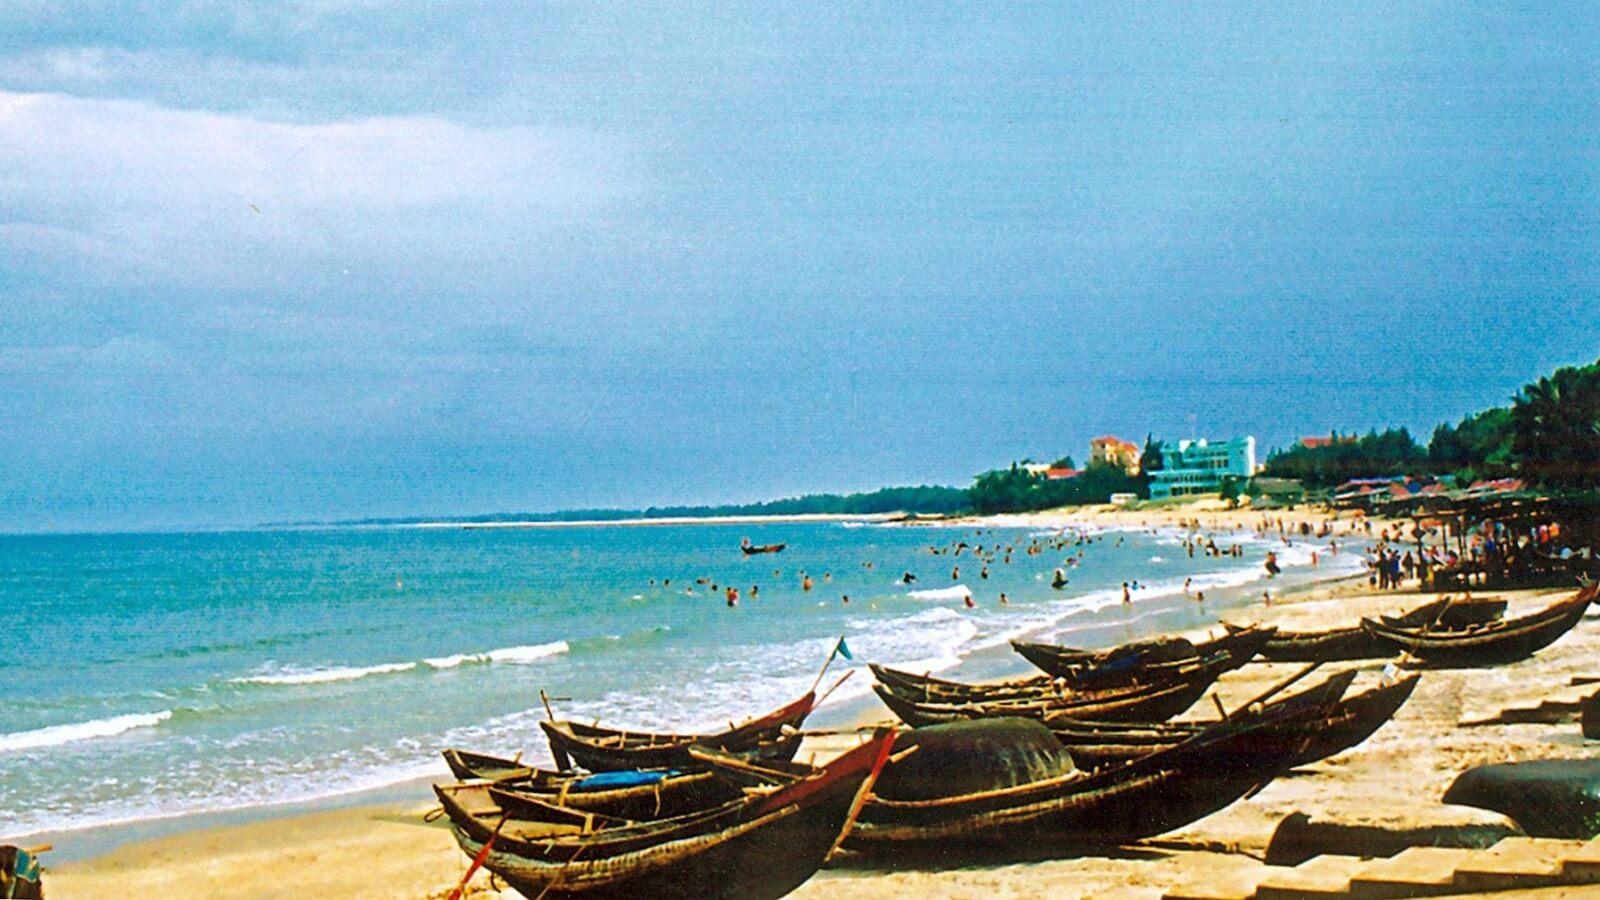 Top 10 bãi biển miền bắc